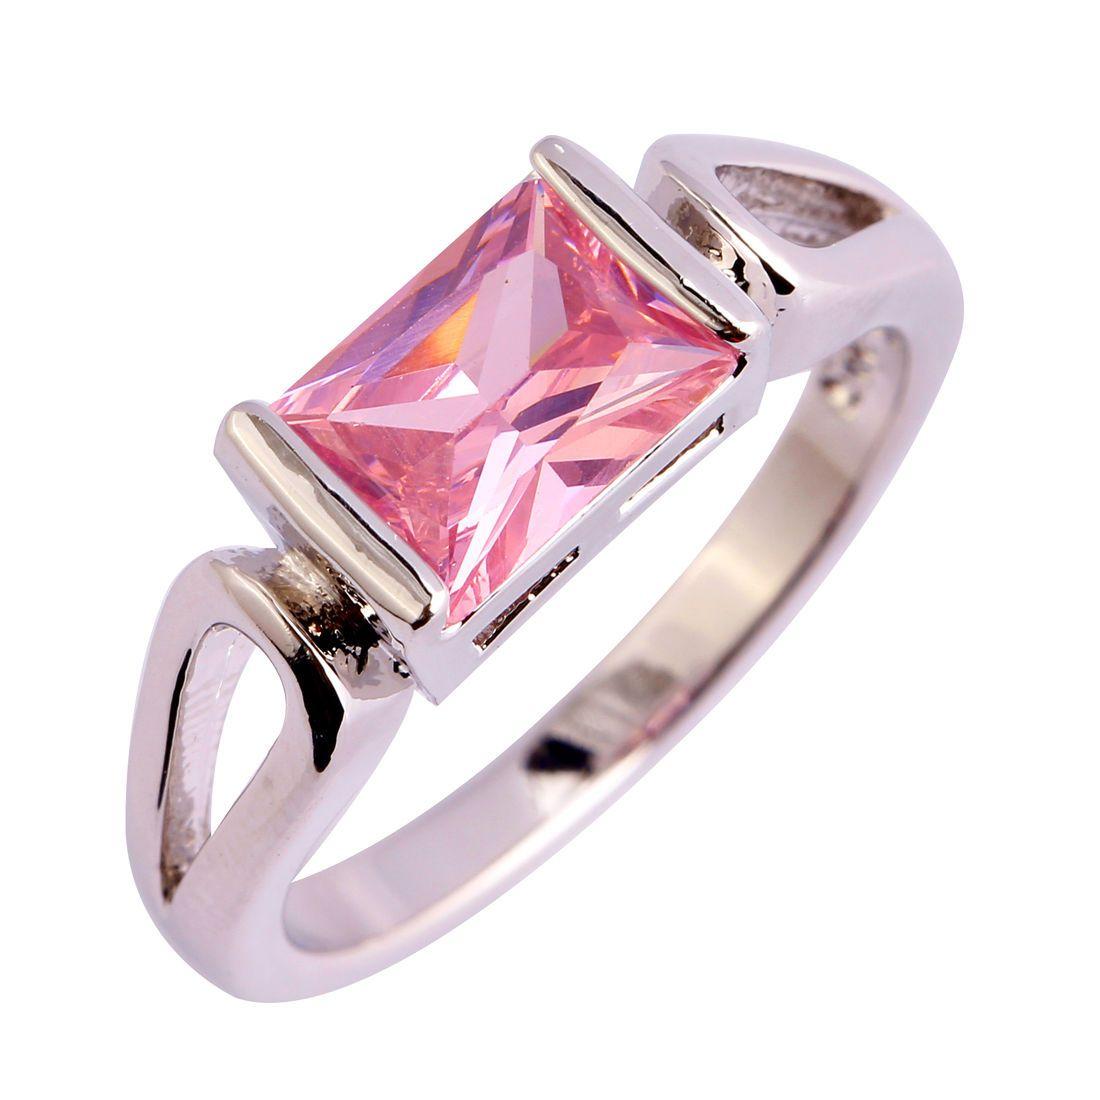 Wedding Emerald Cut Bezel Pink Topaz Gemstones Silver Rings Size 7 8 ...